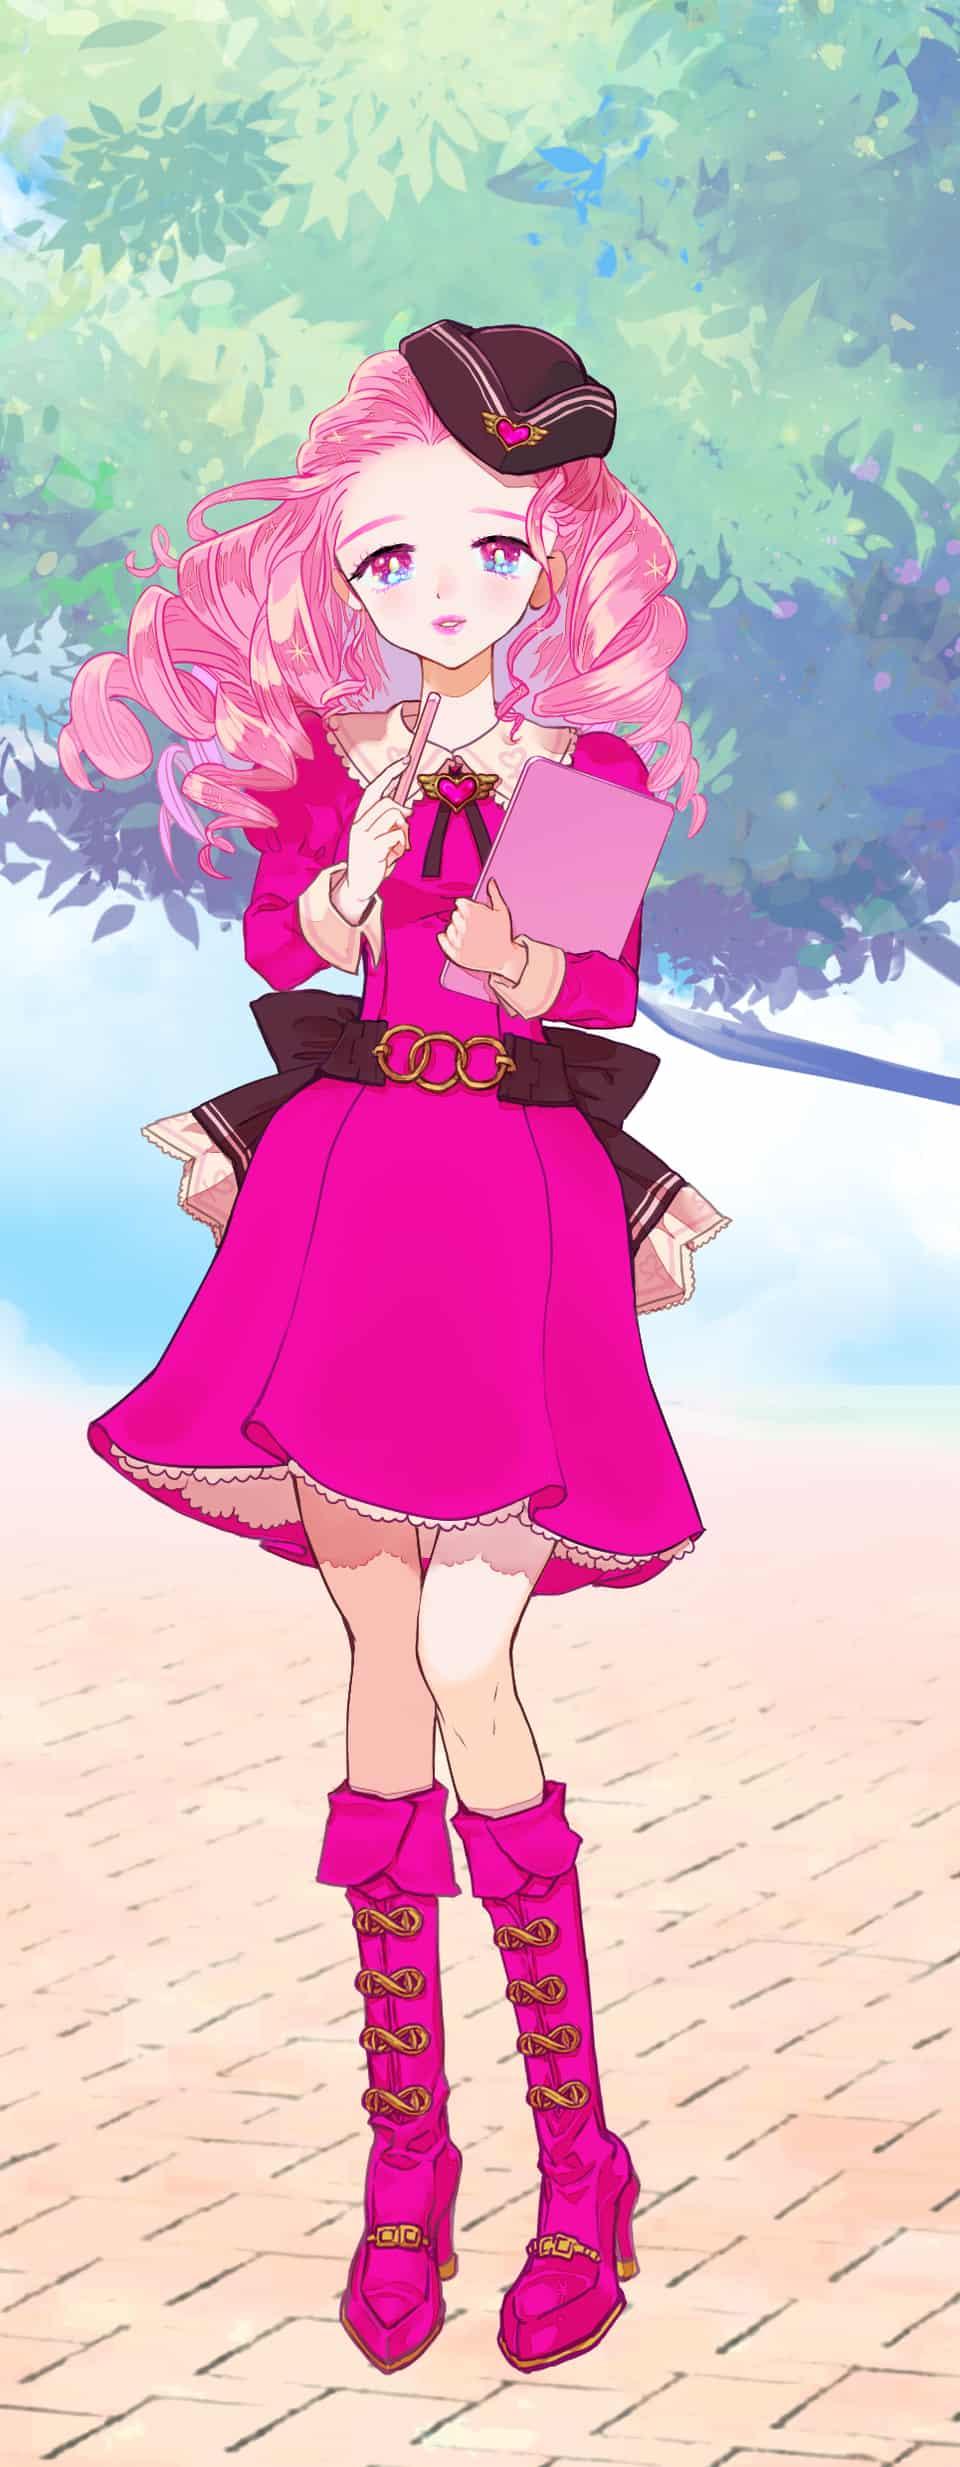 PASTEL SKETCH PINK Illust of SB PASTEL_SKETCH2020 illustration お嬢様 デコだし kawaii pink girl character